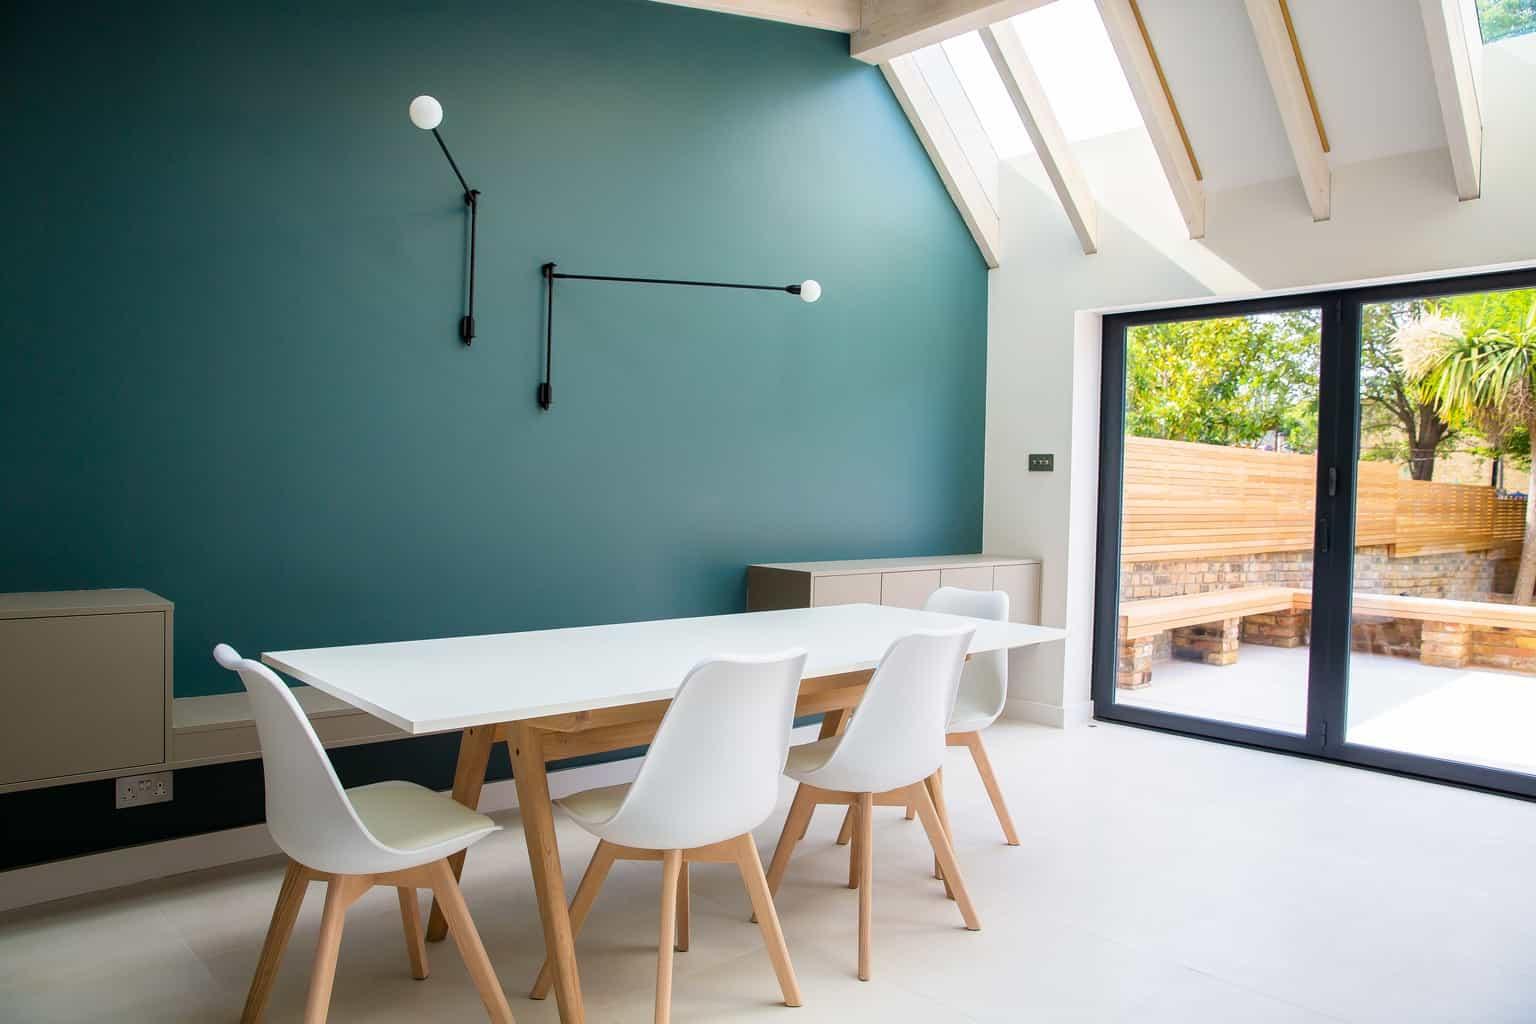 interior design, project management, house home garden refurbishment, renovation, extension, modernisation, balham, wandsworth